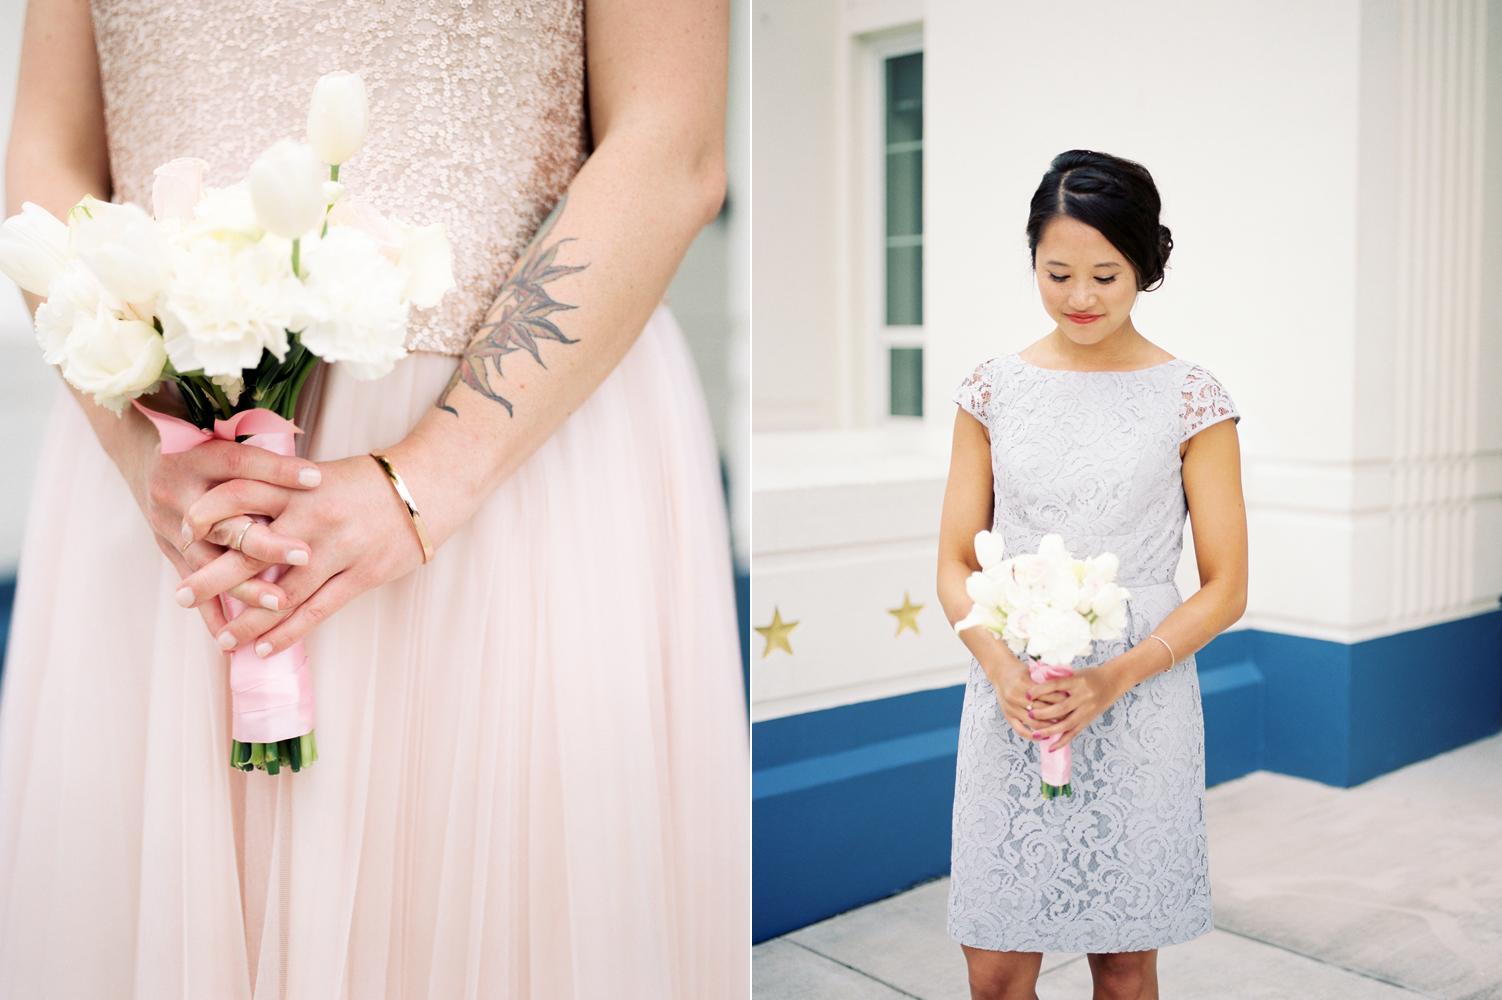 seattle bridesmaid style pastel dresses wedding photography.jpg